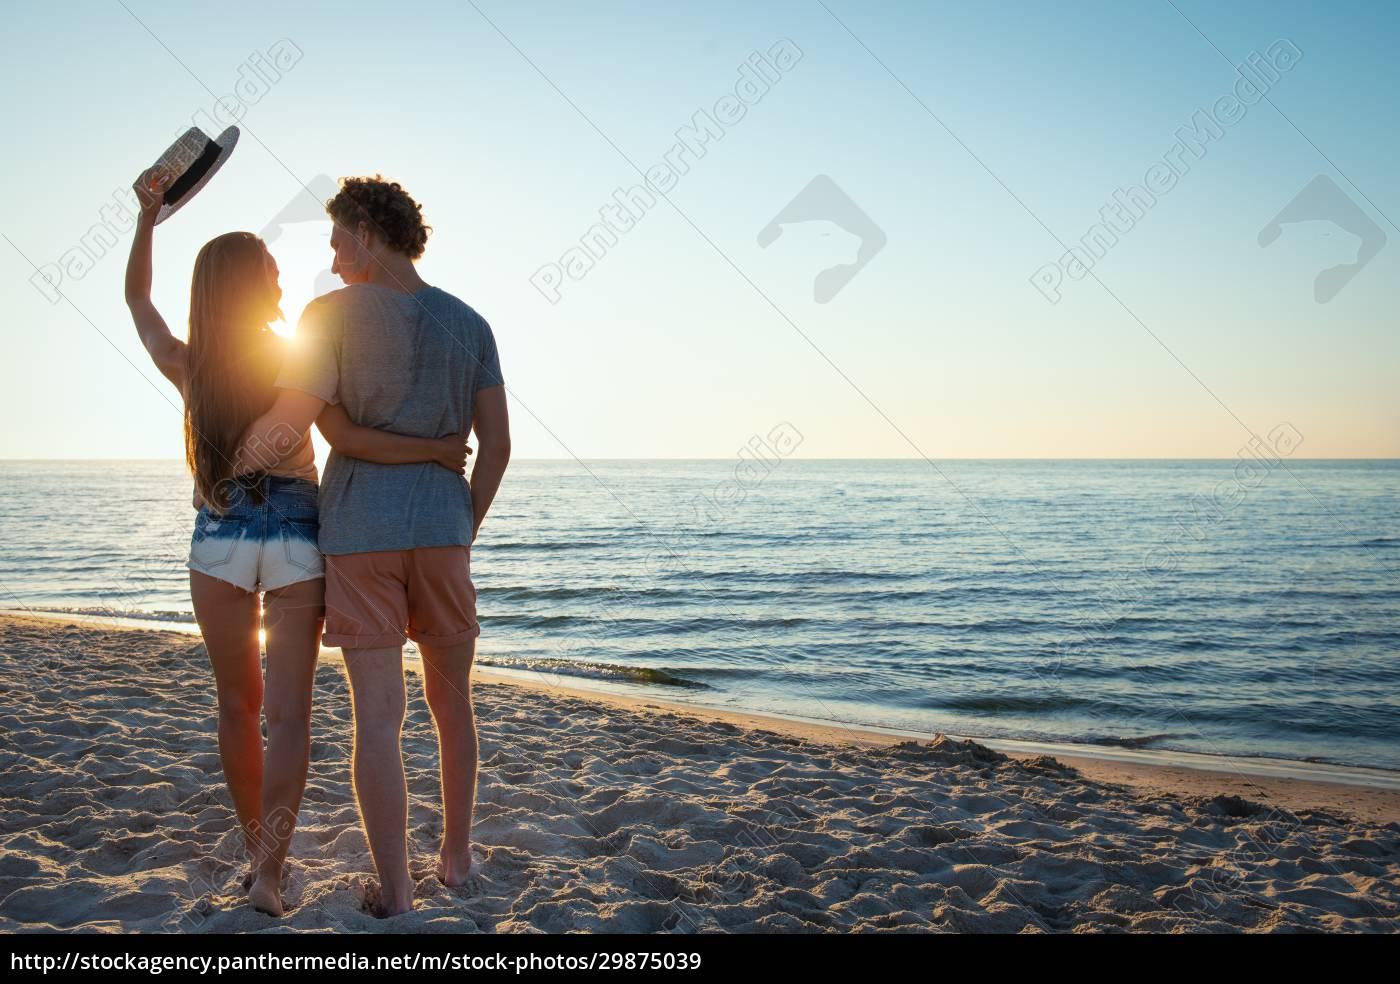 junge, paare, bei, sonnenaufgang, am, strand - 29875039